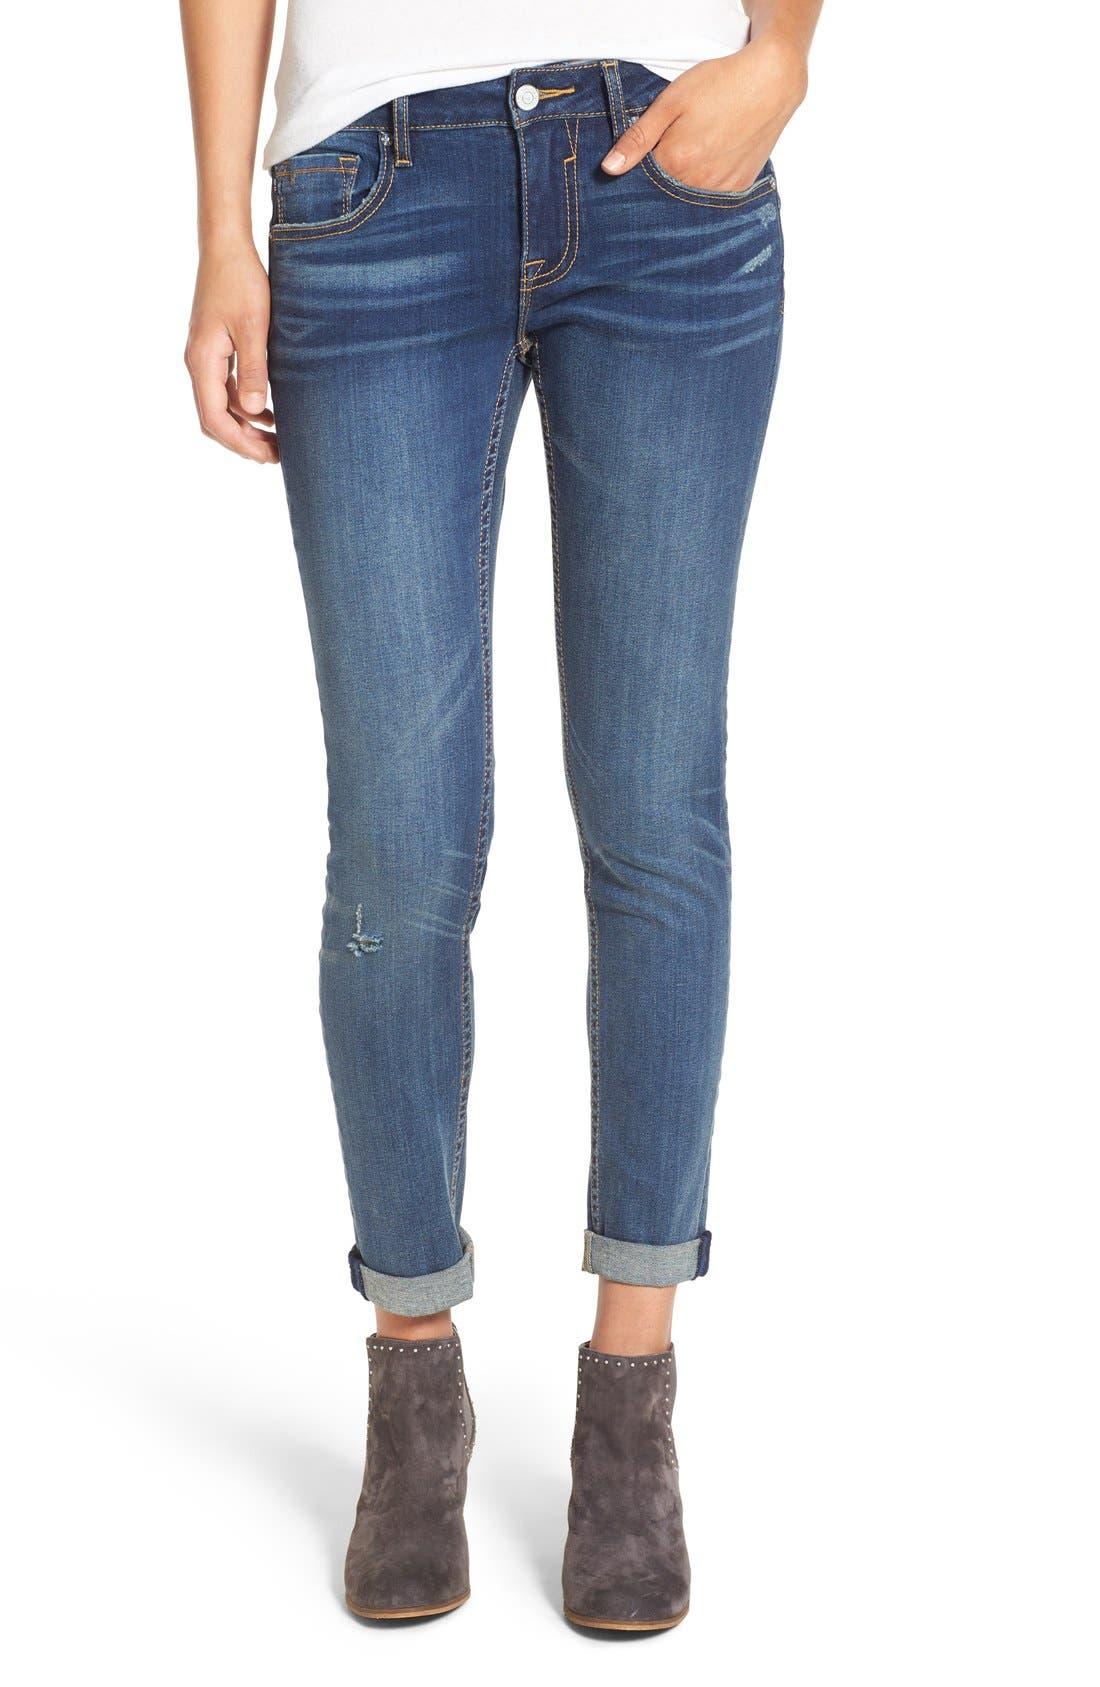 VIGOSS, 'Thompson' Distressed Skinny Jeans, Main thumbnail 1, color, 400